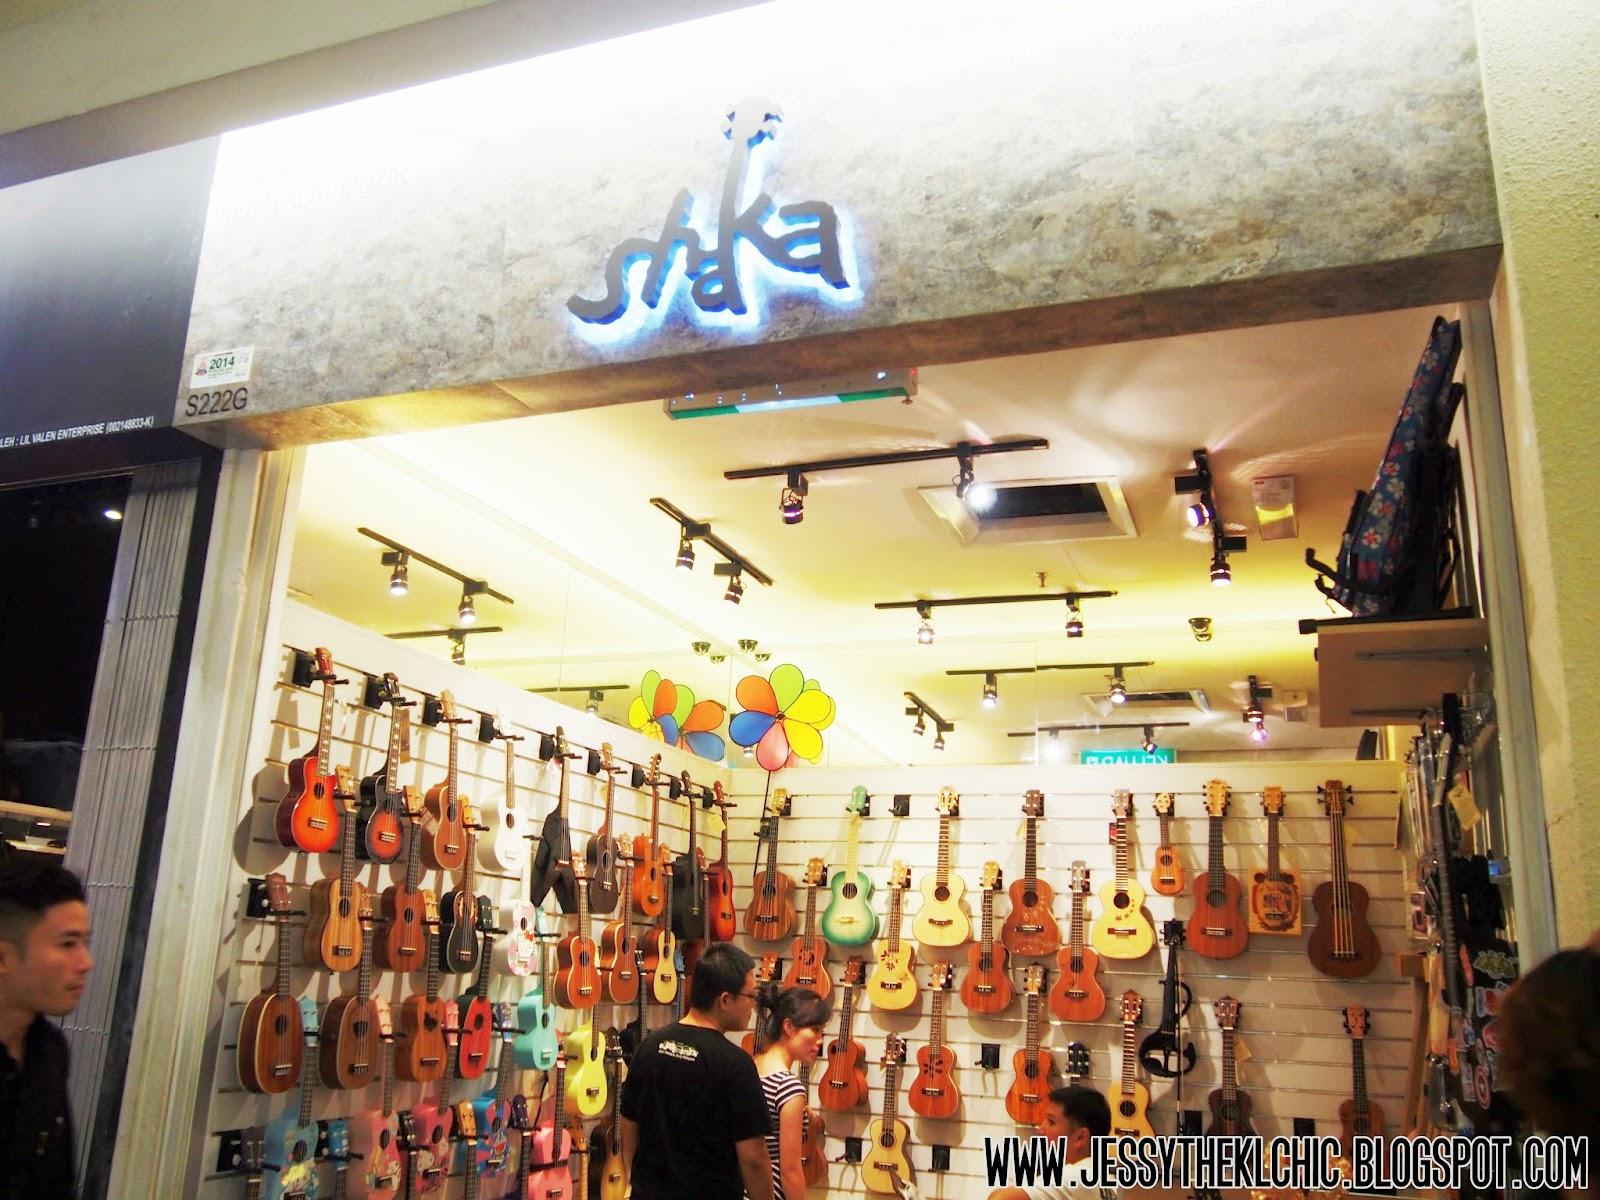 place shaka ukulele club 1 utama mall bandar utama jessy the kl chic malaysia food. Black Bedroom Furniture Sets. Home Design Ideas